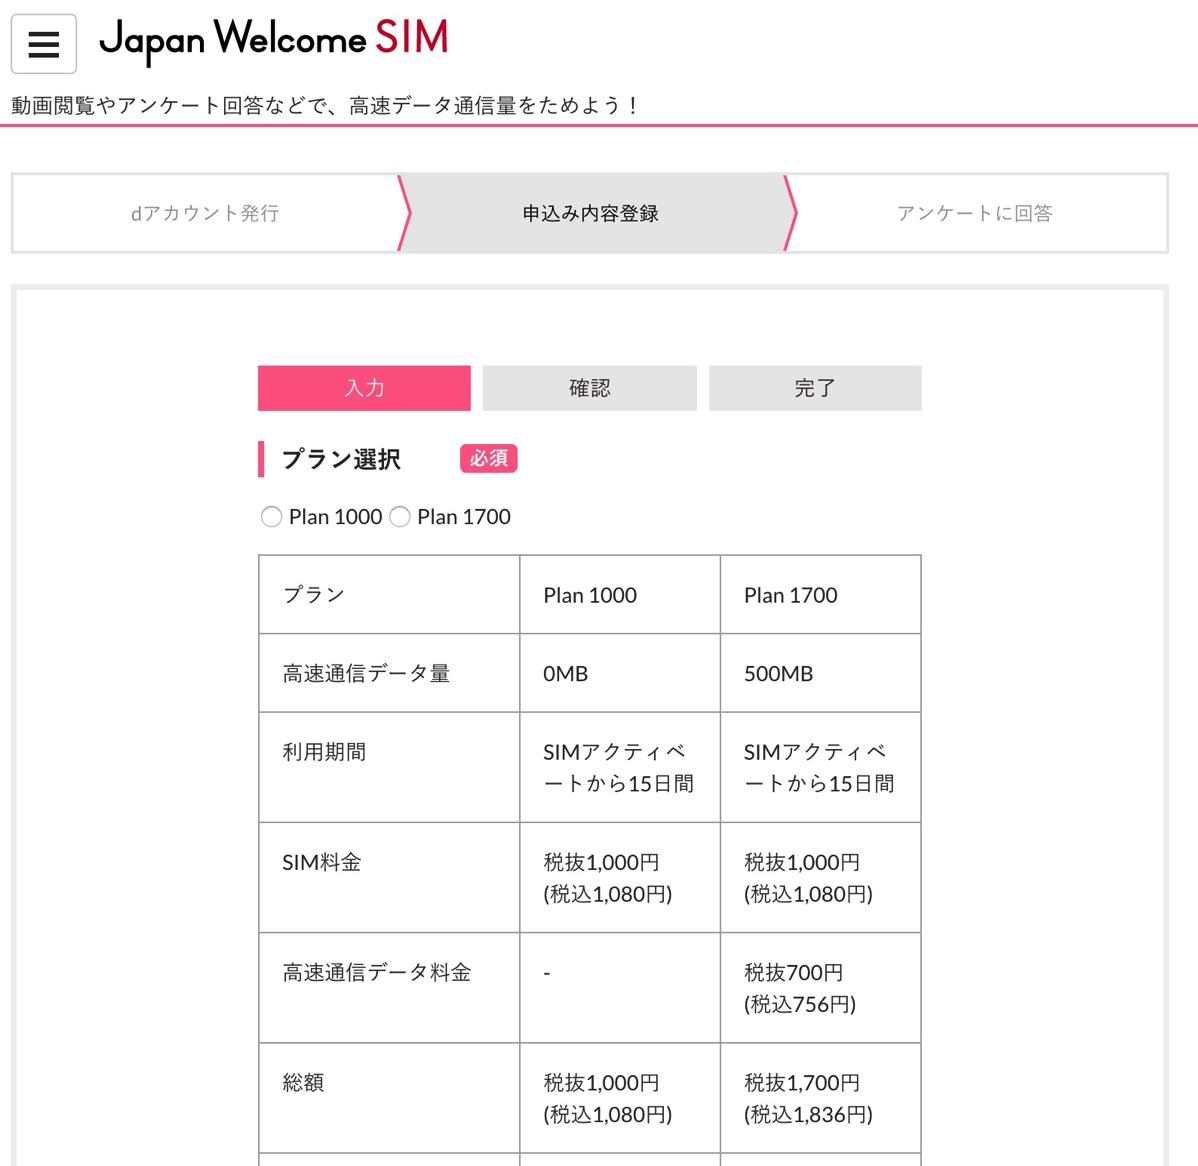 「Japan Welcome SIM」のプラン選択&受取情報を入力して申込する